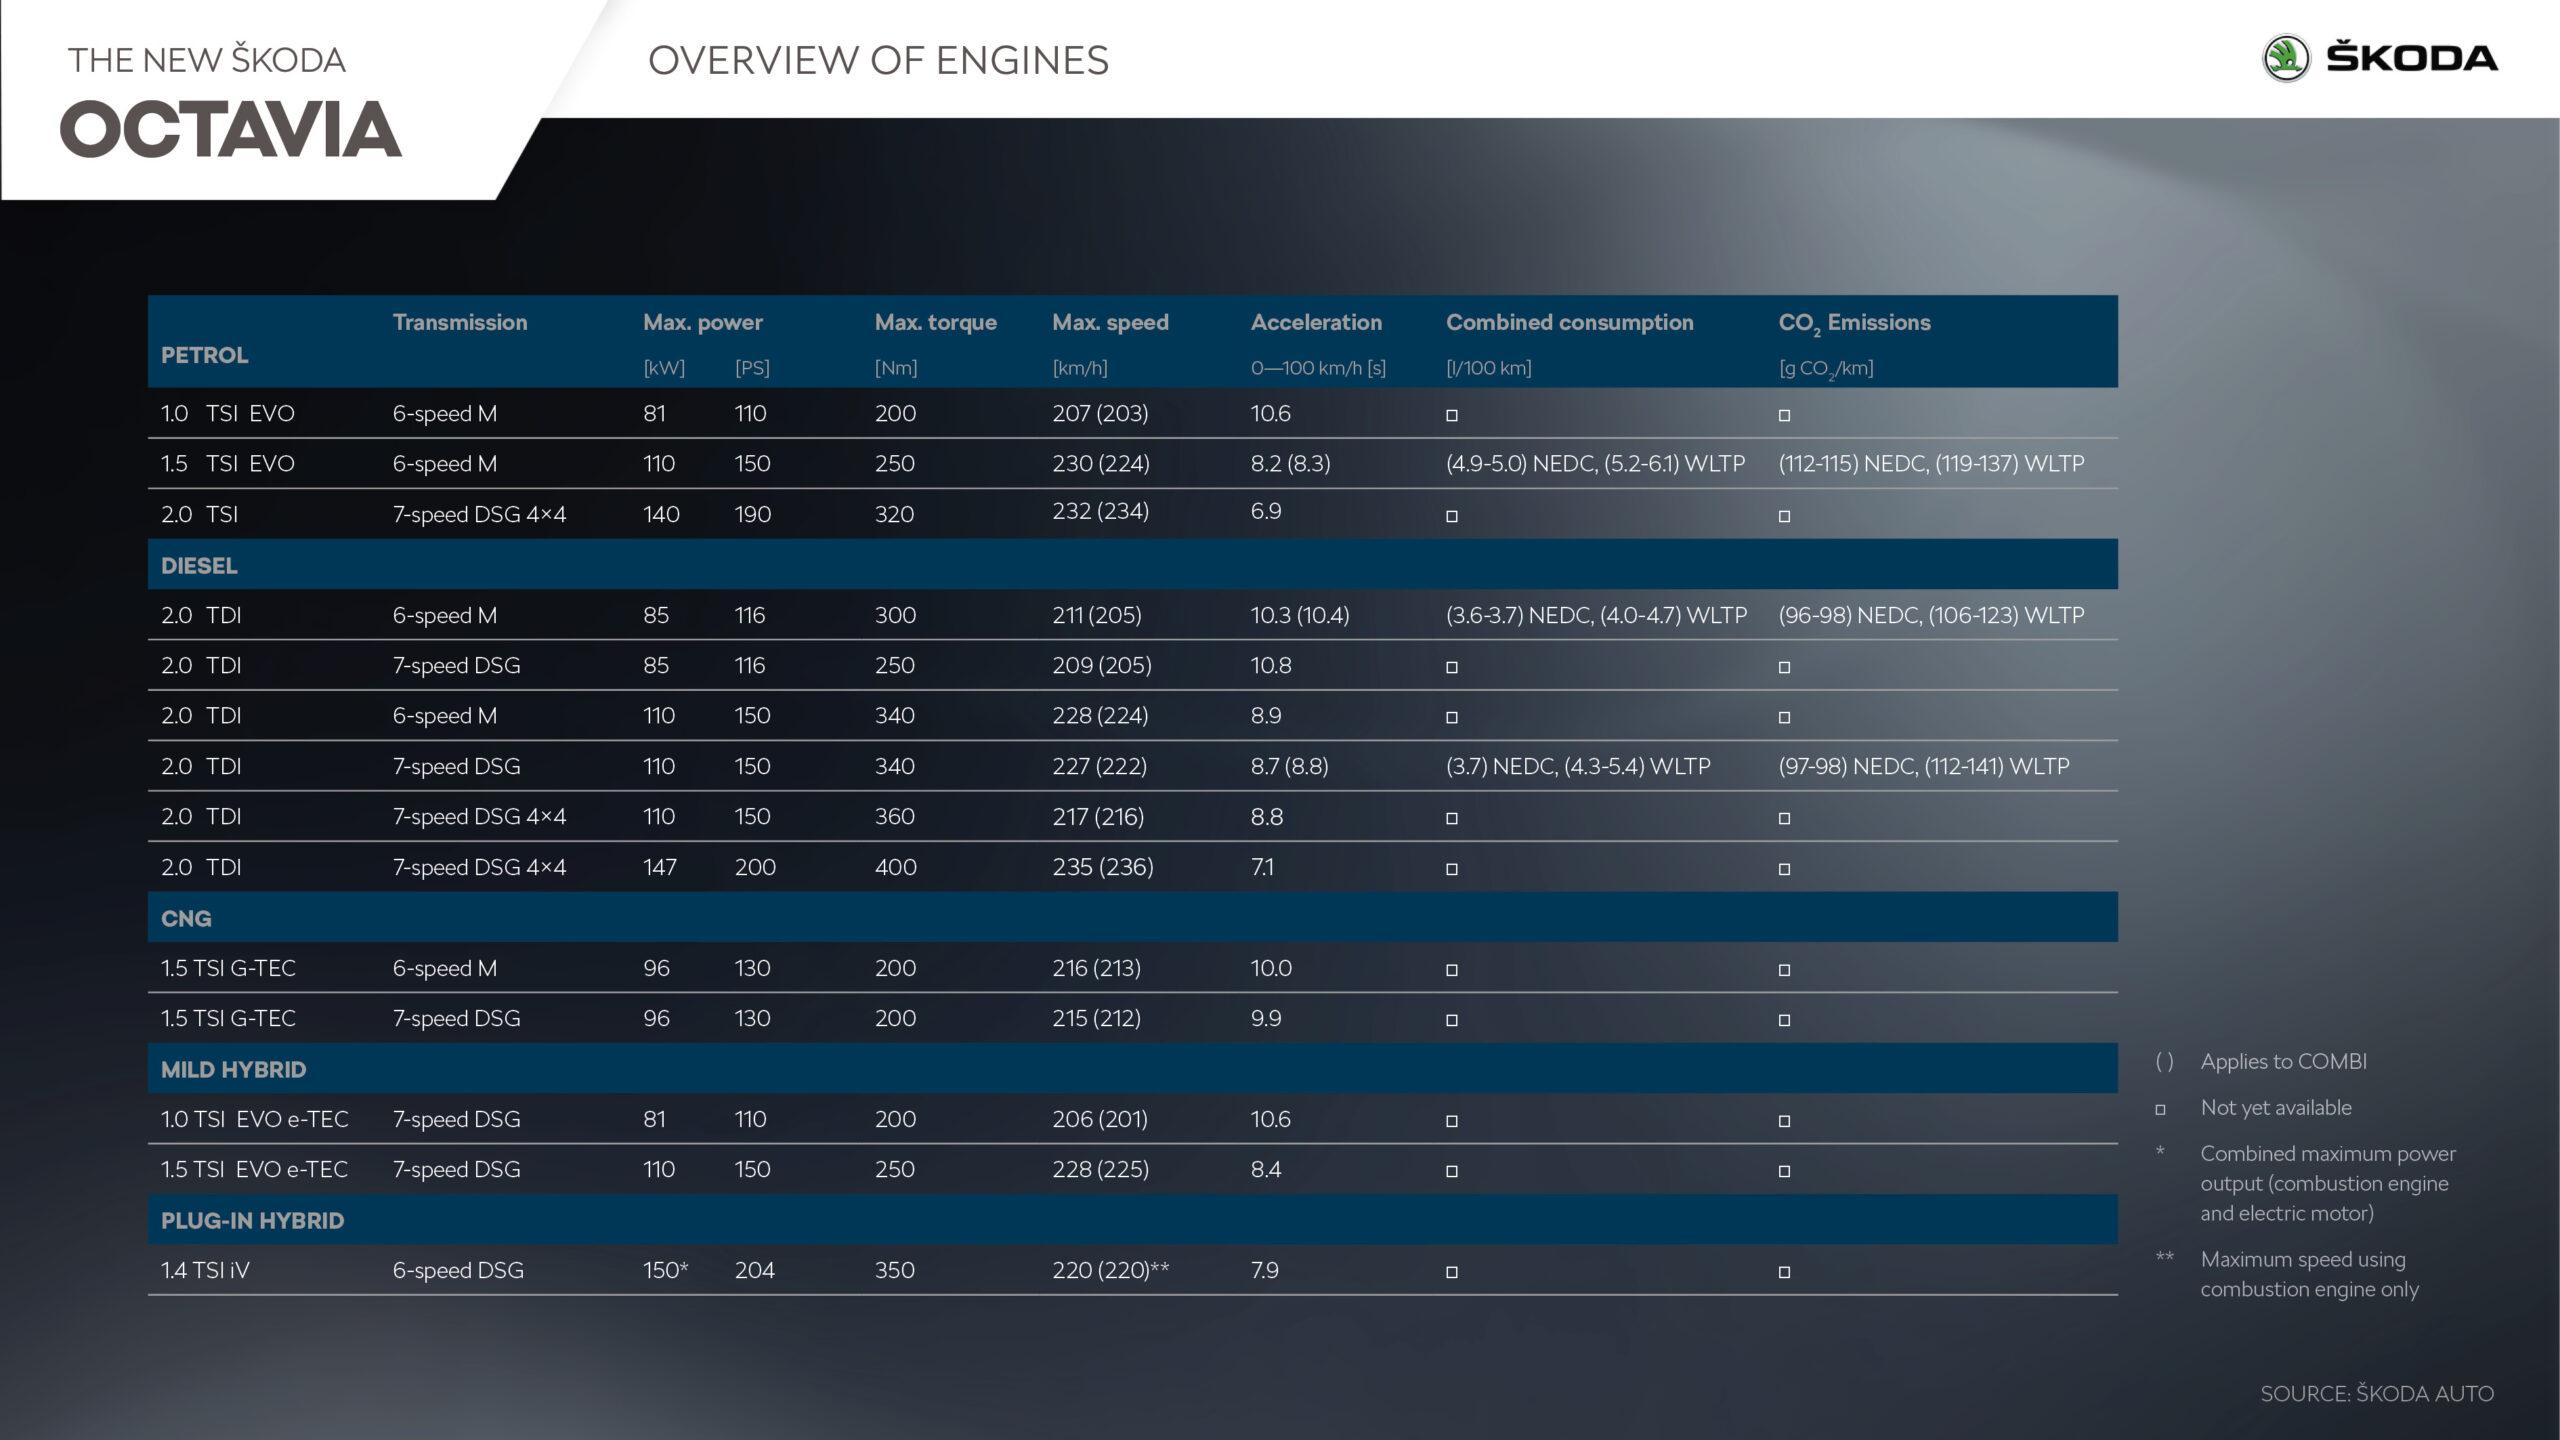 Skoda Octavia powertrain options